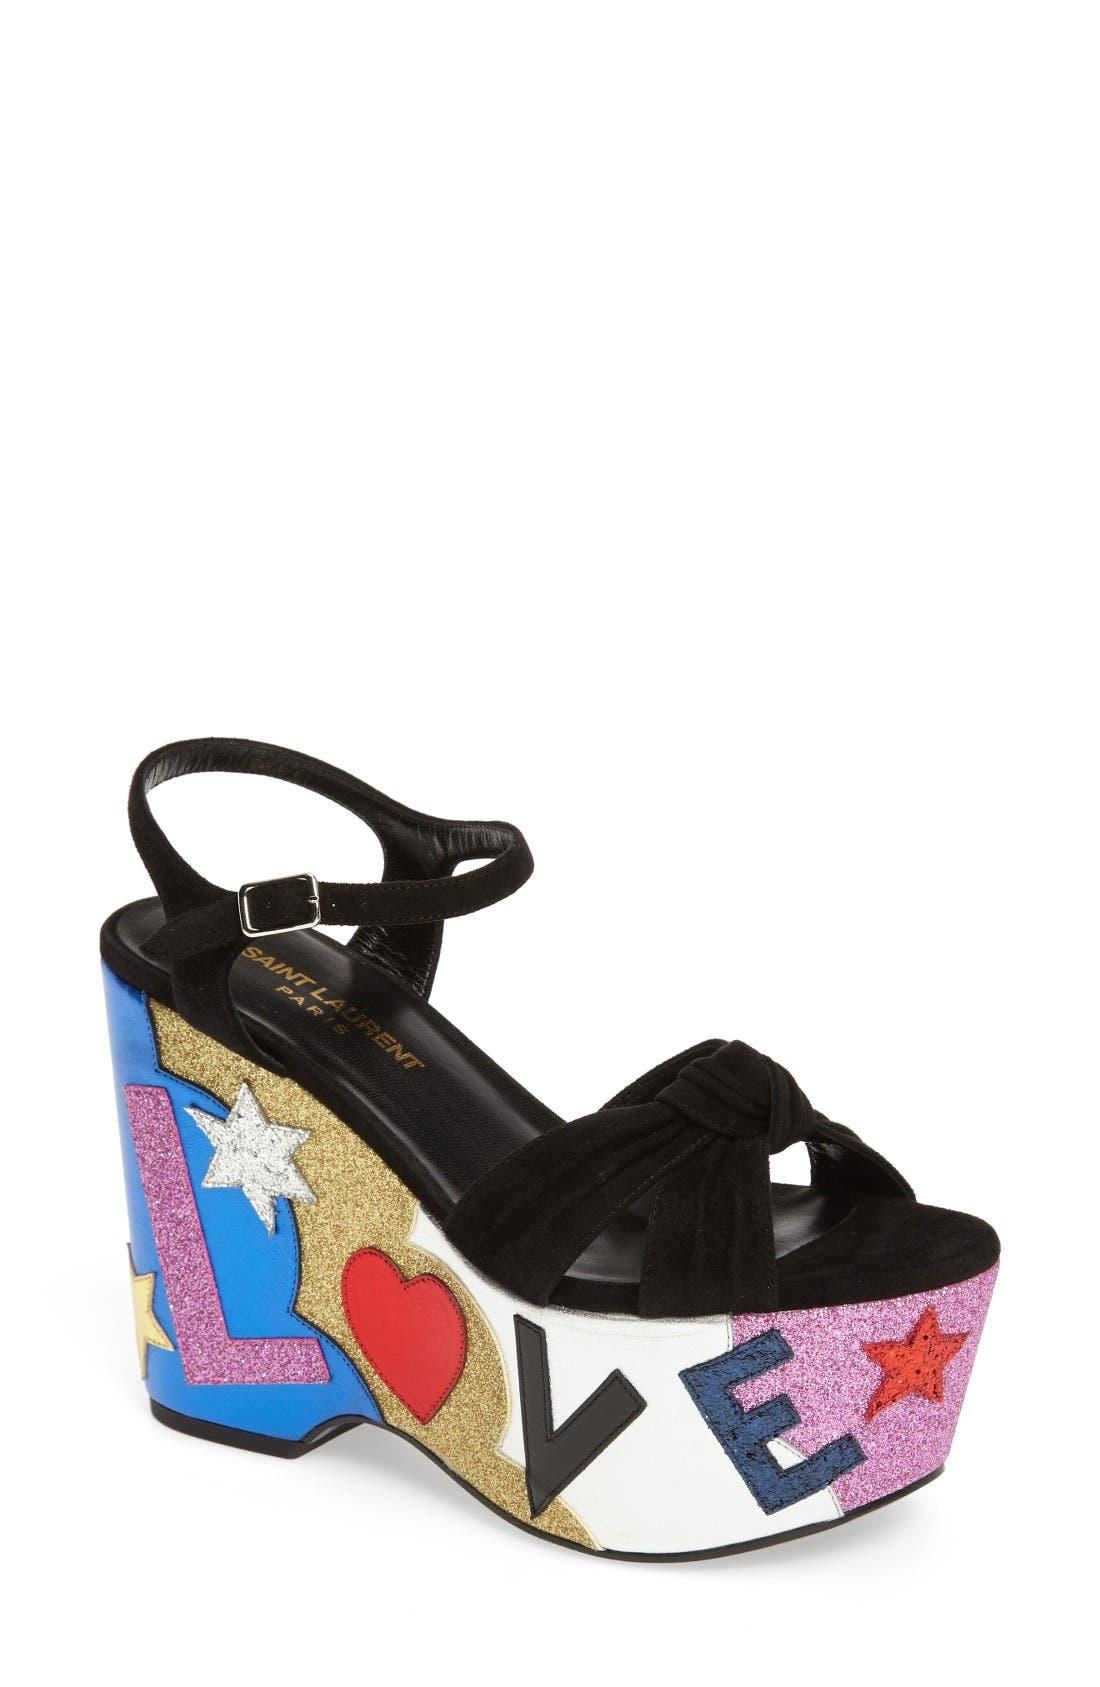 Alternate Image 1 Selected - Saint Laurent Candy Platform Sandal (Women)